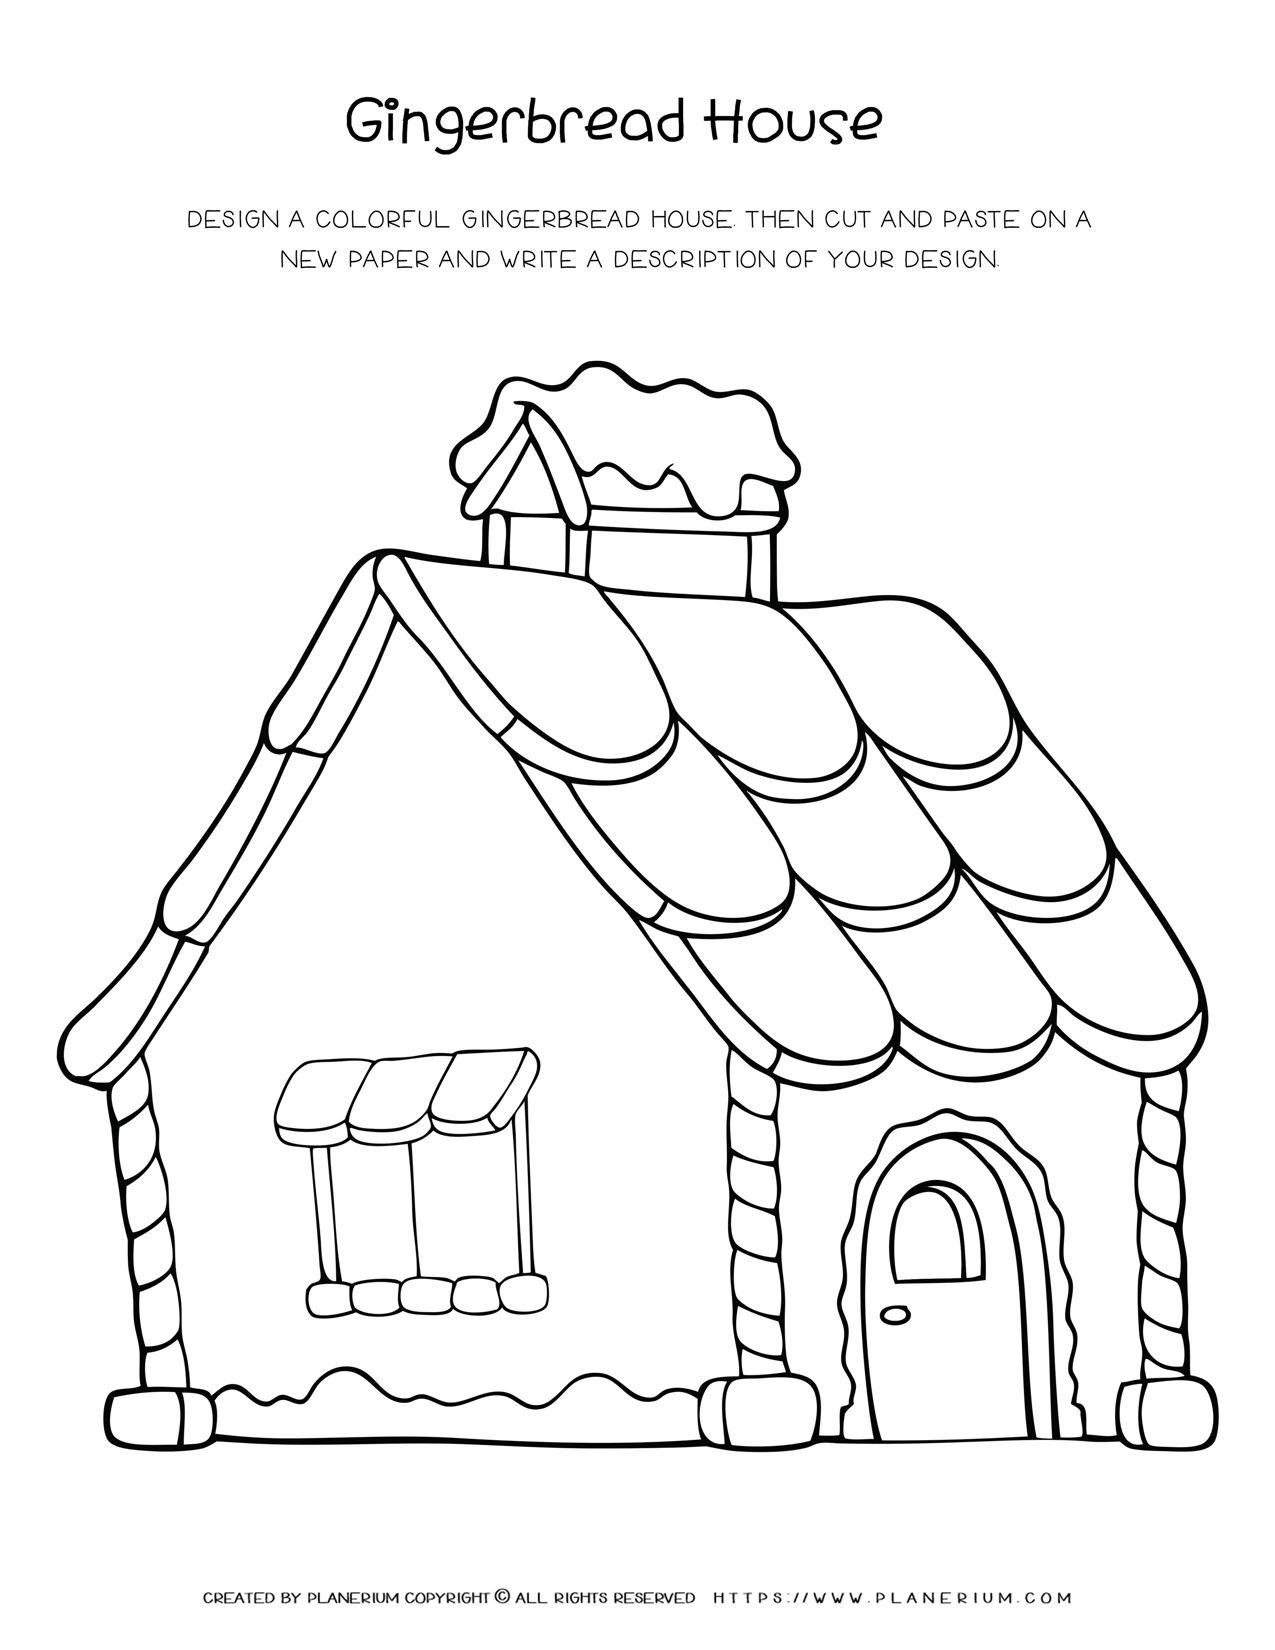 Christmas Worksheet - Gingerbread House Design | Planerium